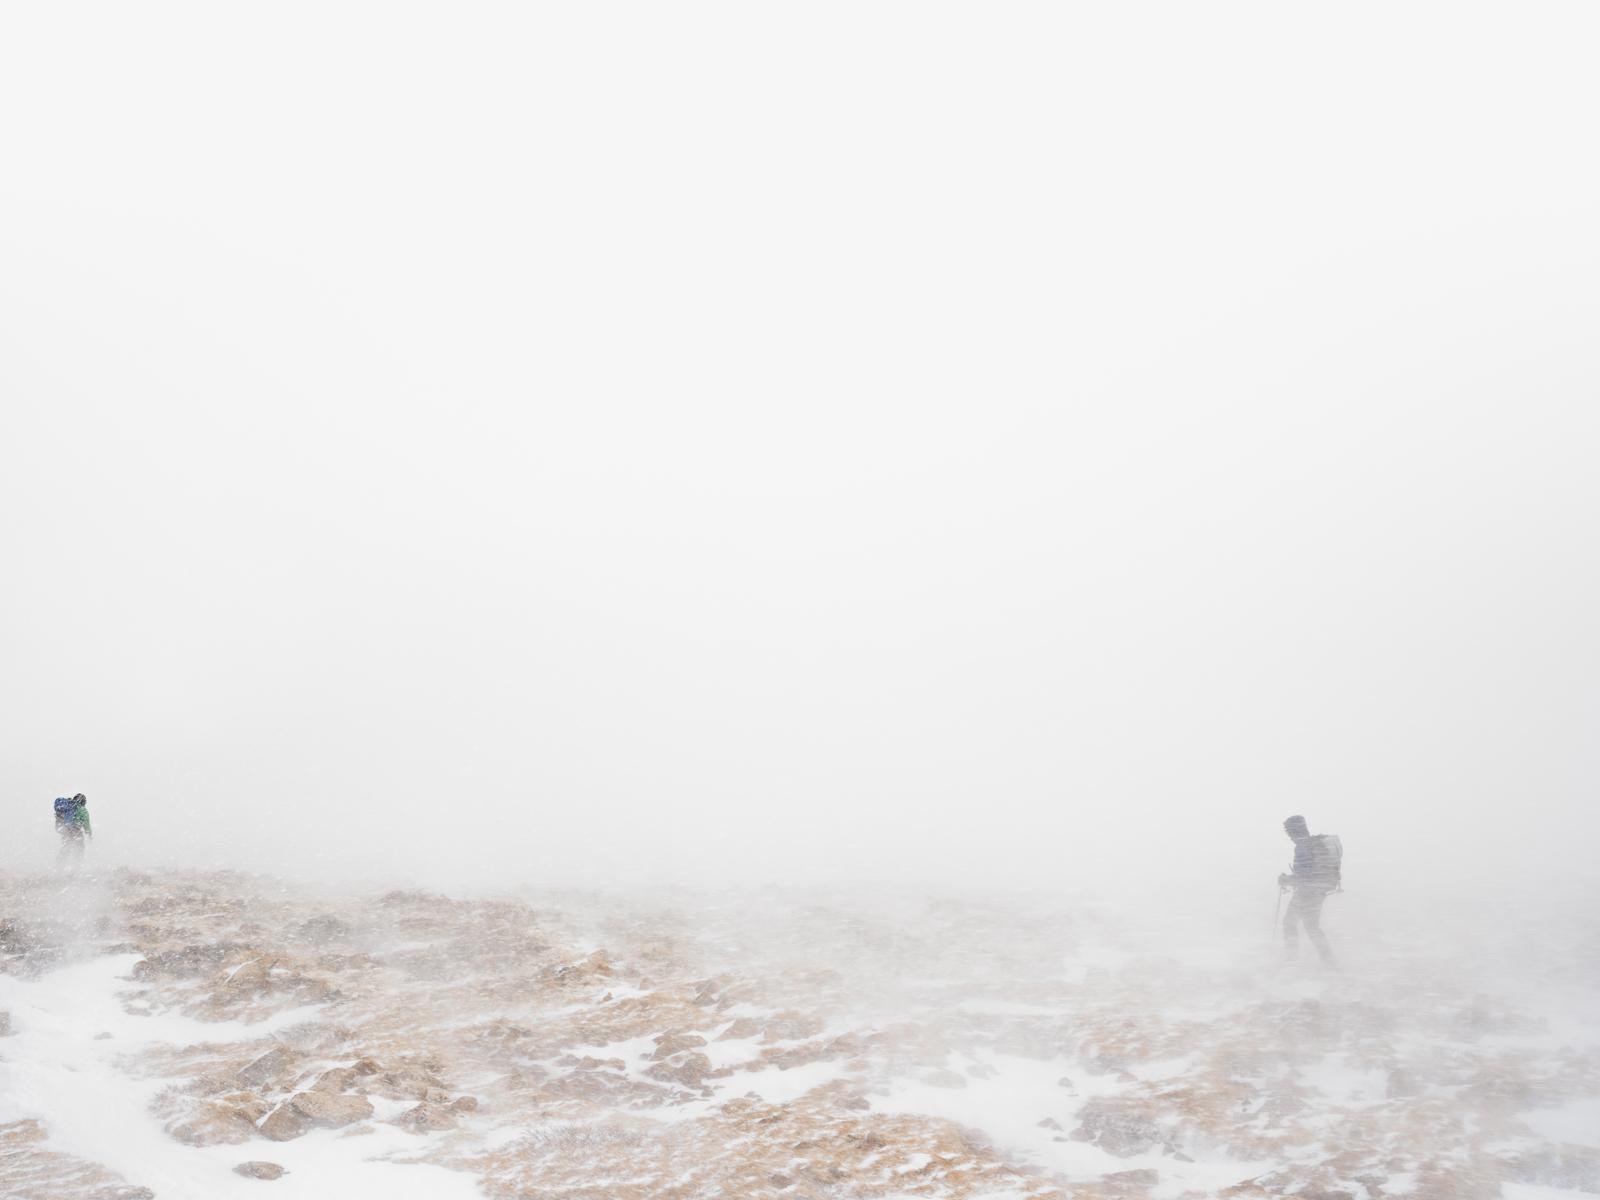 Researchers during a whiteout, Niwot Ridge, Colorado. © Lucas Foglia, courtesy of Michael Hoppen Gallery, London.